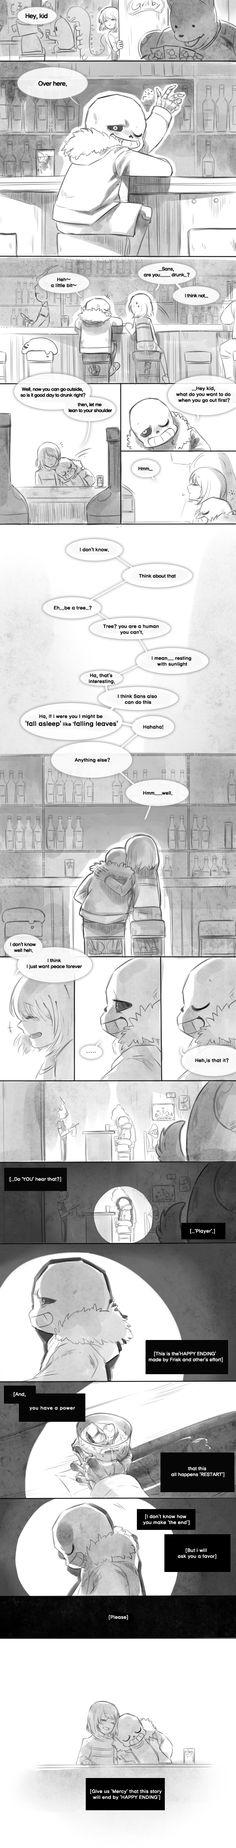 Sans and Frisk - comic